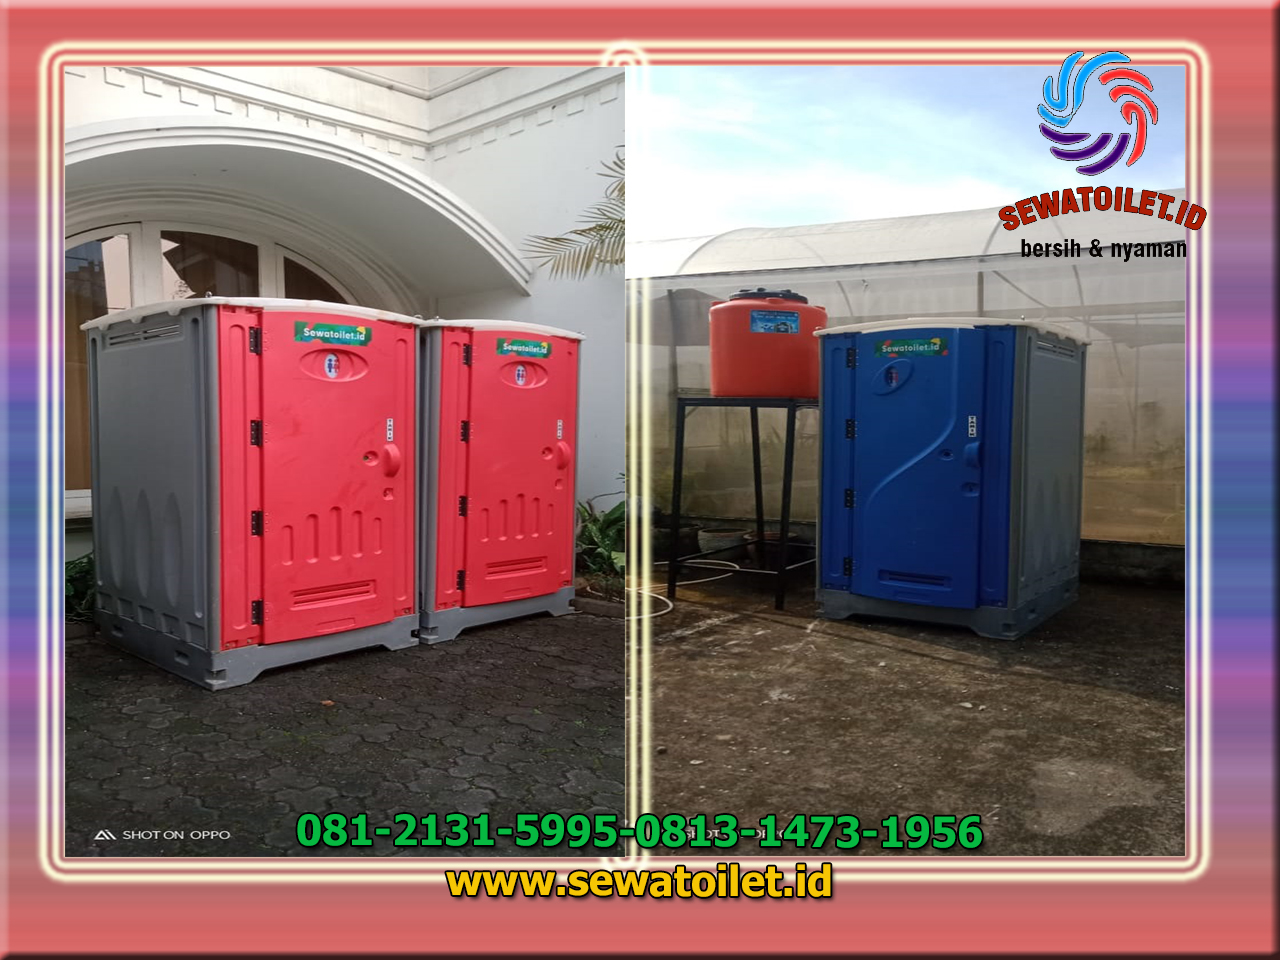 Jasa Sewa Toilet Portable Bersih Harum di Tangerang